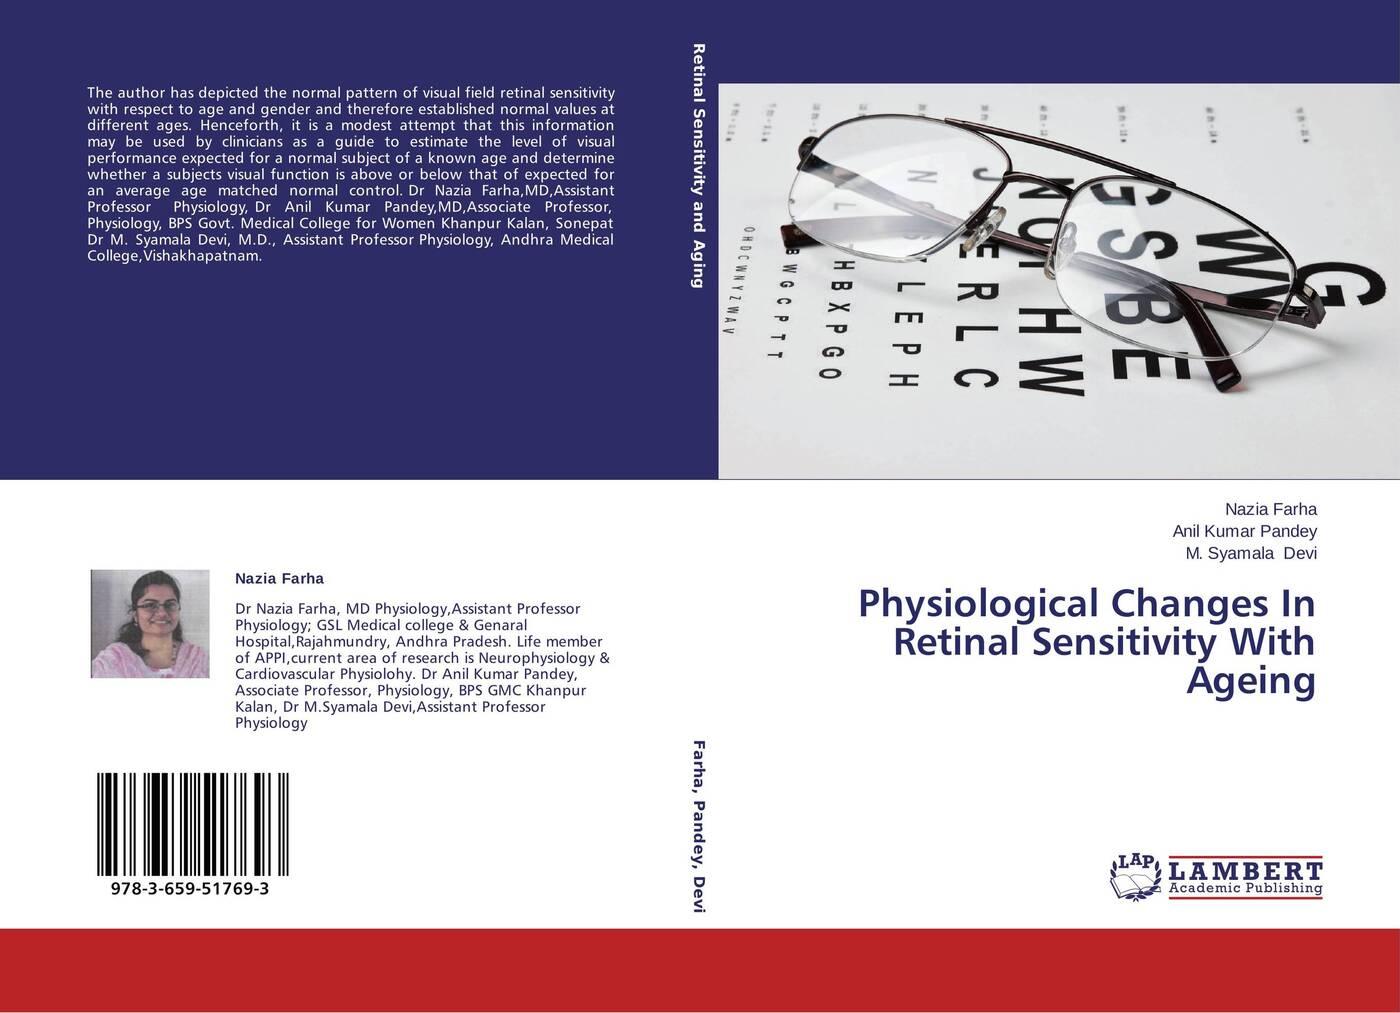 Nazia Farha,Anil Kumar Pandey and M. Syamala Devi Physiological Changes In Retinal Sensitivity With Ageing недорго, оригинальная цена